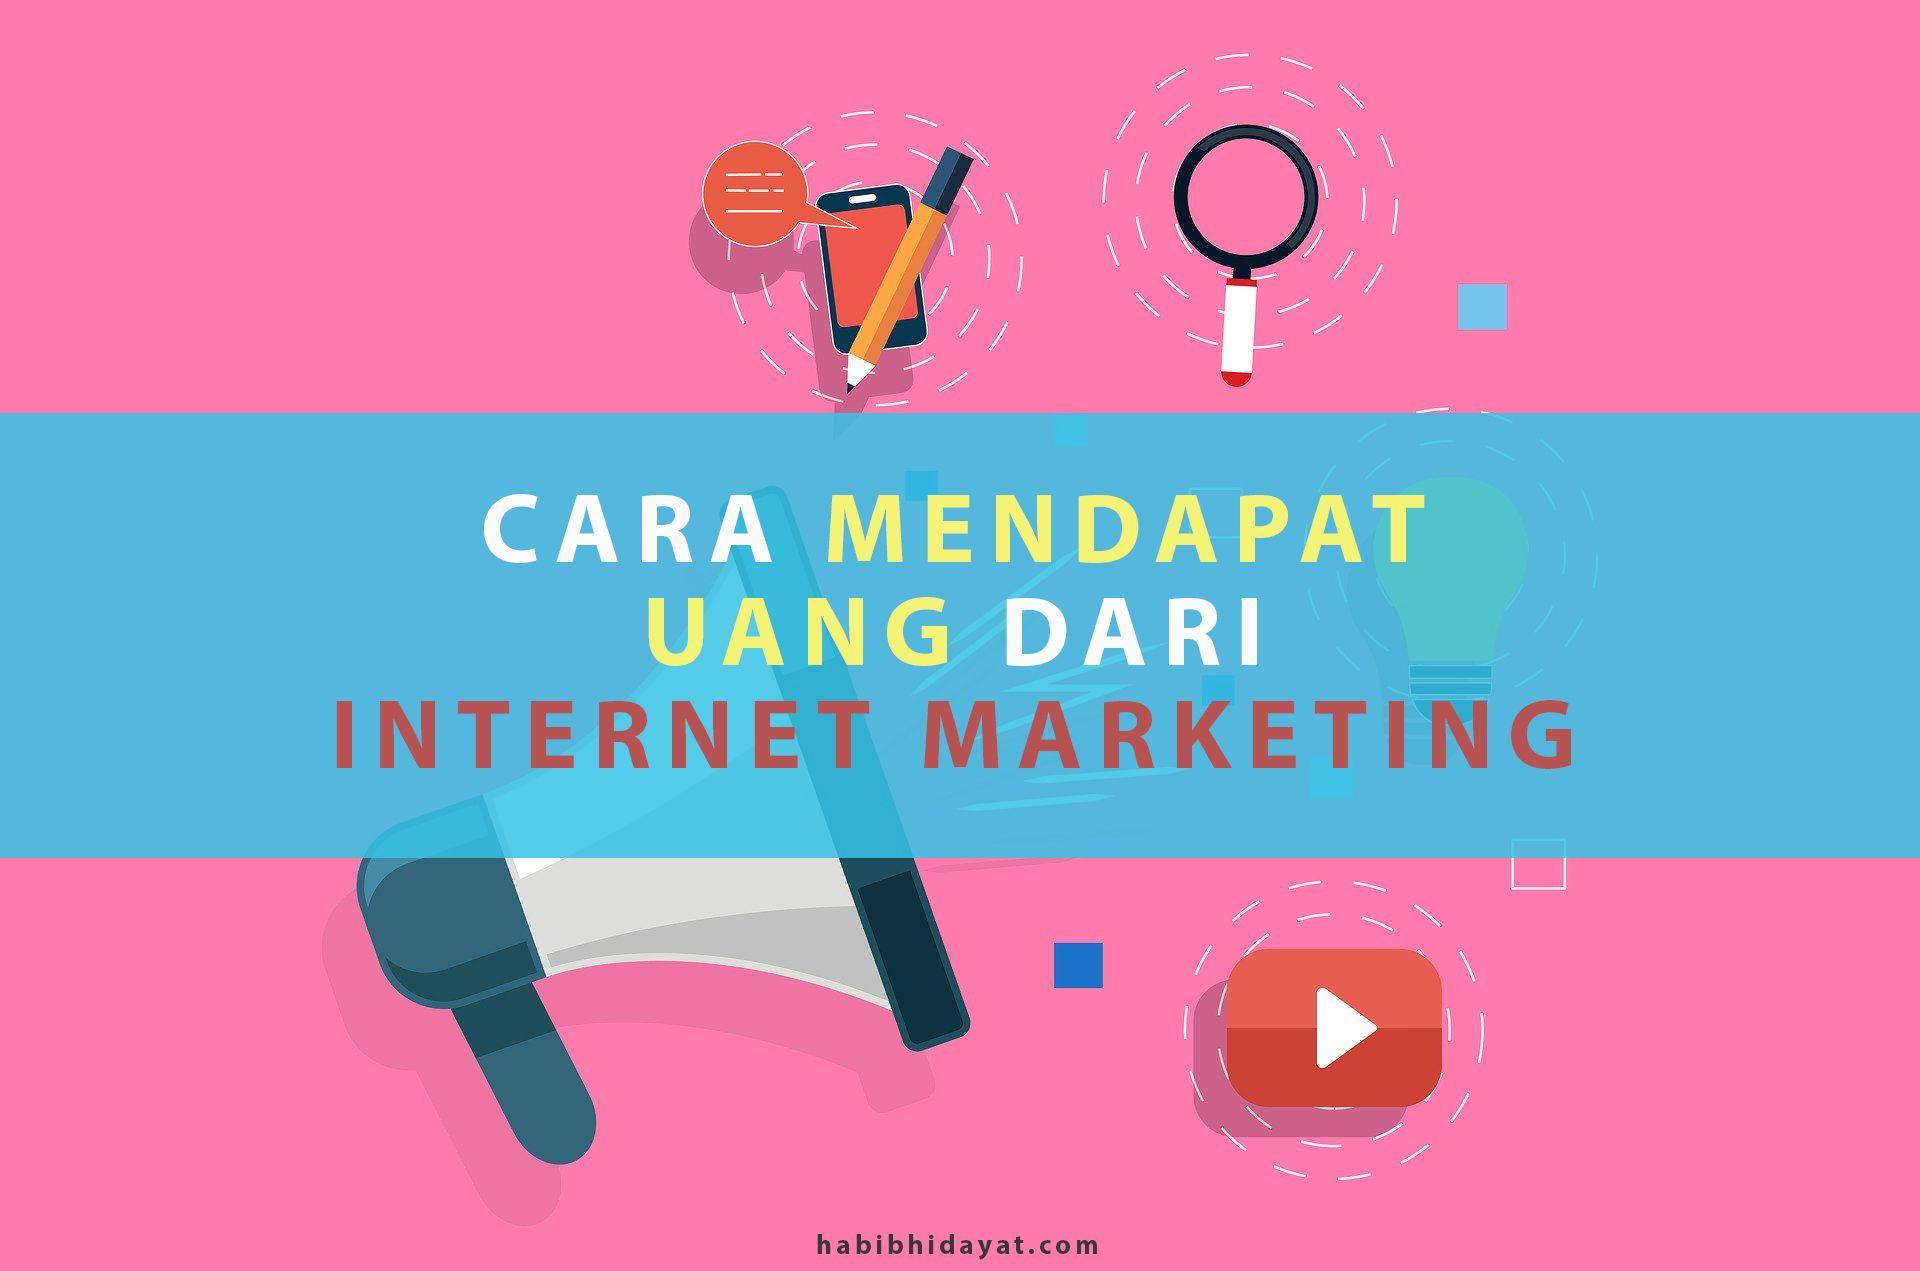 Inilah 5 Cara Mendapatkan Uang Dengan Internet Marketing Marketing Internet Teknologi